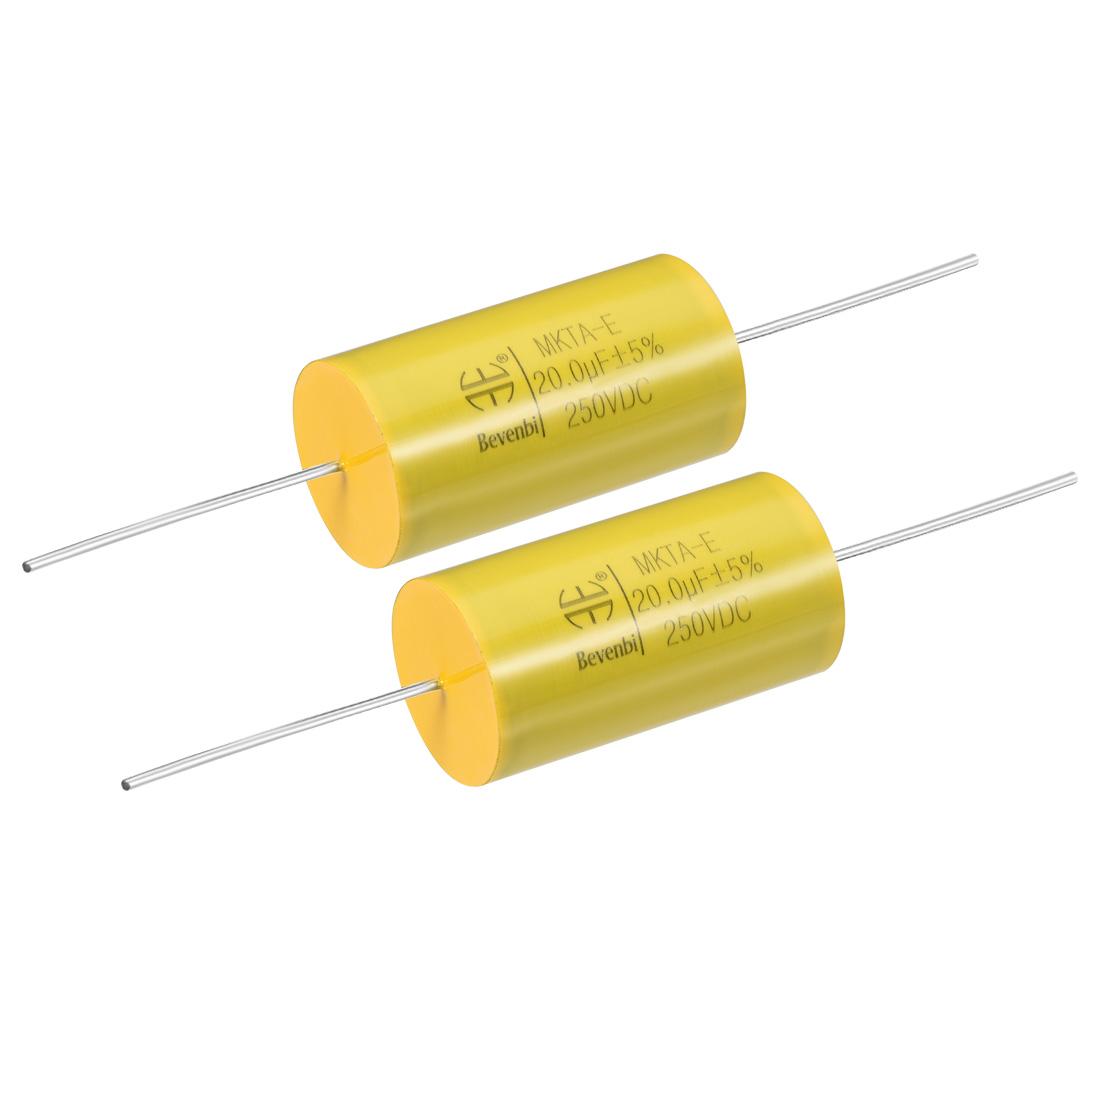 Film Capacitor 250V DC 20.0uF MKTA-E Round Polypropylene Capacitors Yellow 2pcs